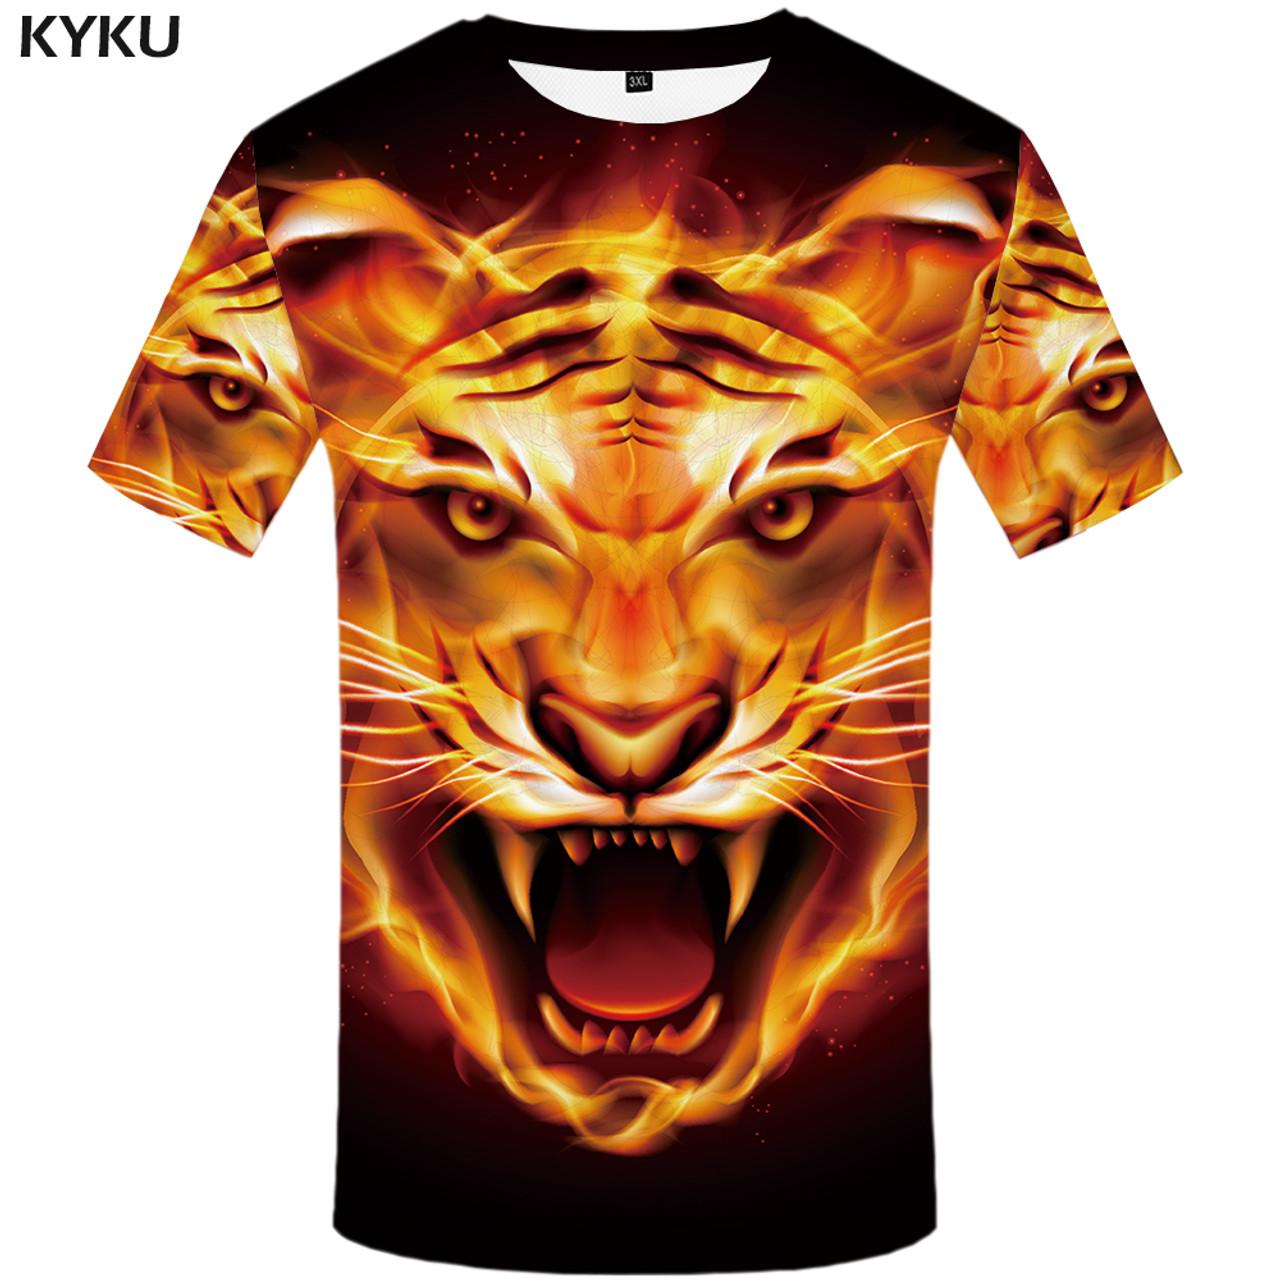 7dcfecd1b11f ... KYKU Brand 3d T-shirt Animal Lion Shirt Camiseta 3d T Shirt Men Funny T  ...